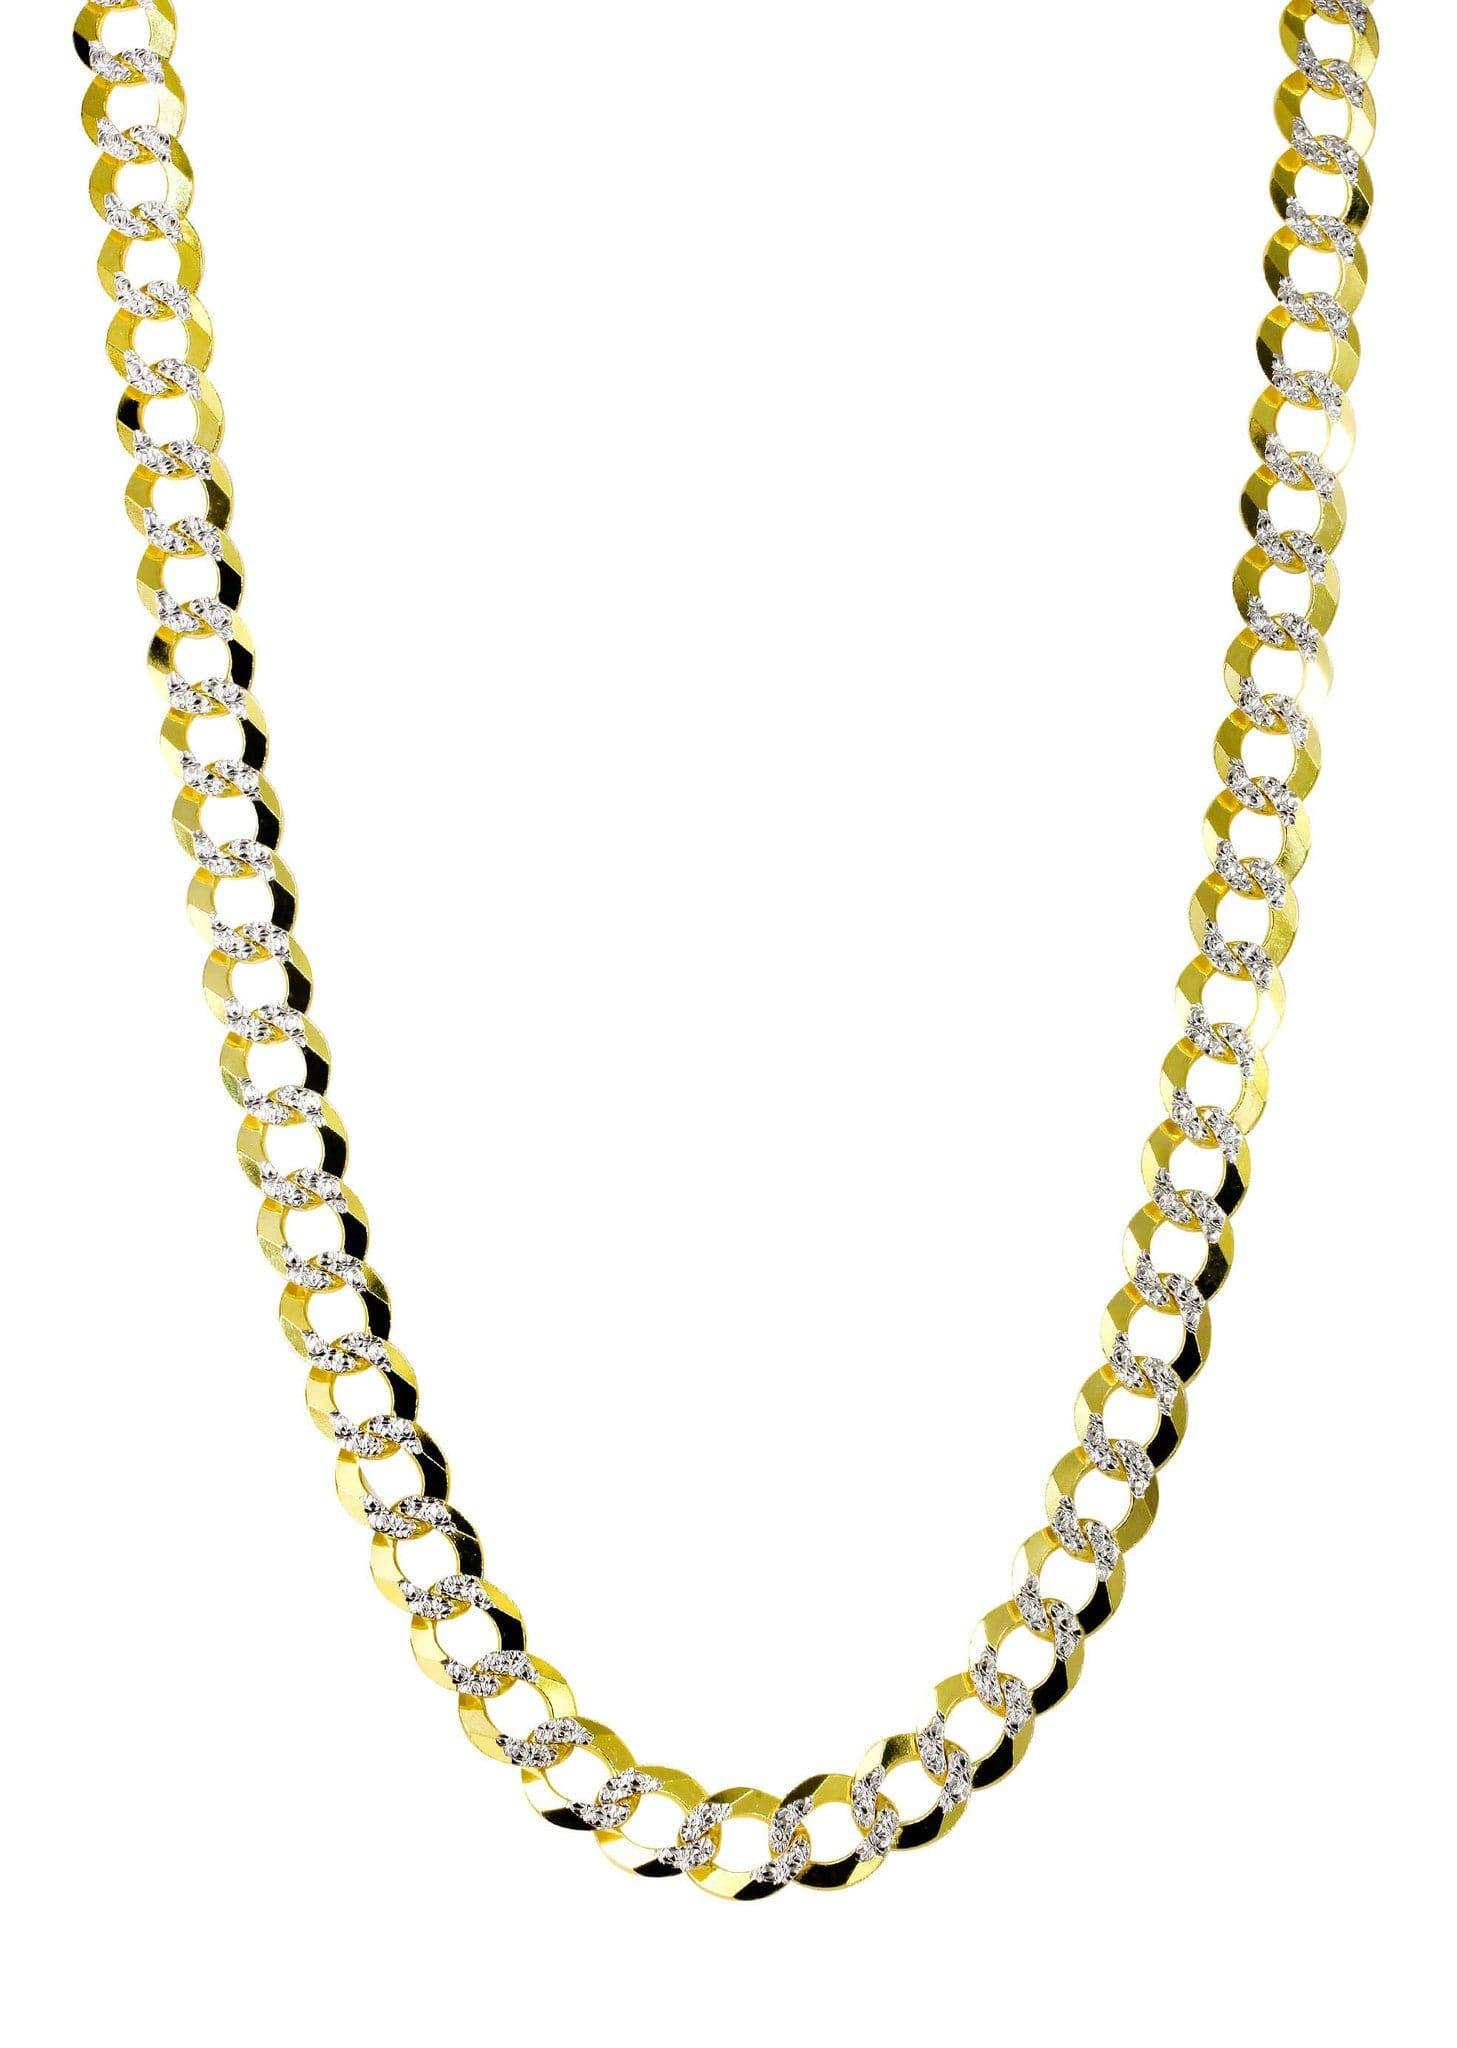 Gold Chain - Hollow Diamond Cut Mens Cuban Link 10k Frostnyc